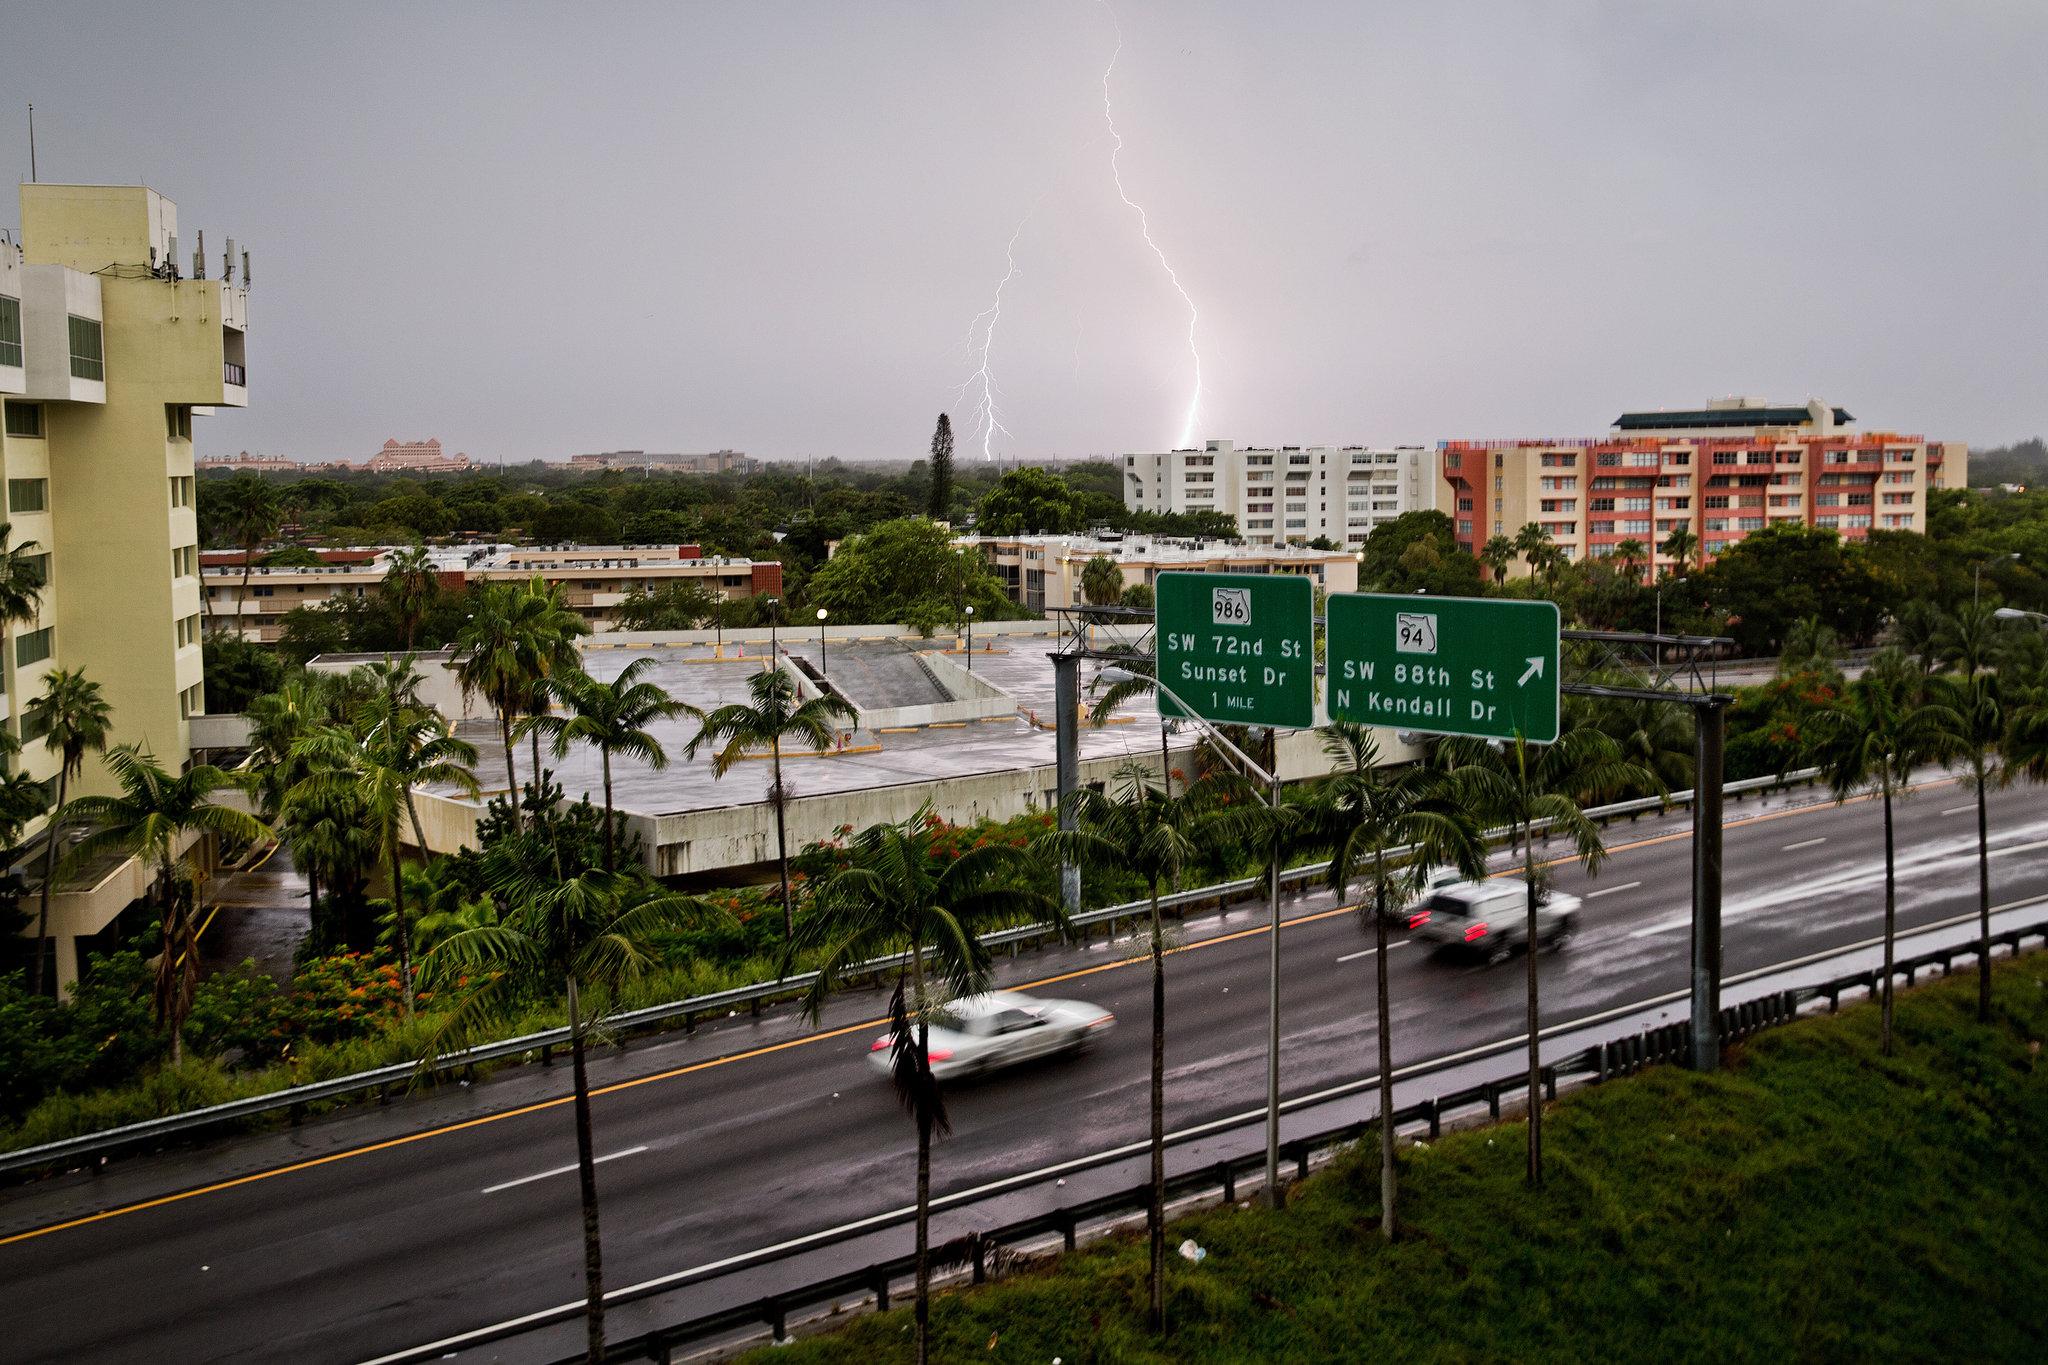 10LIVE STORM lightning superJumbo